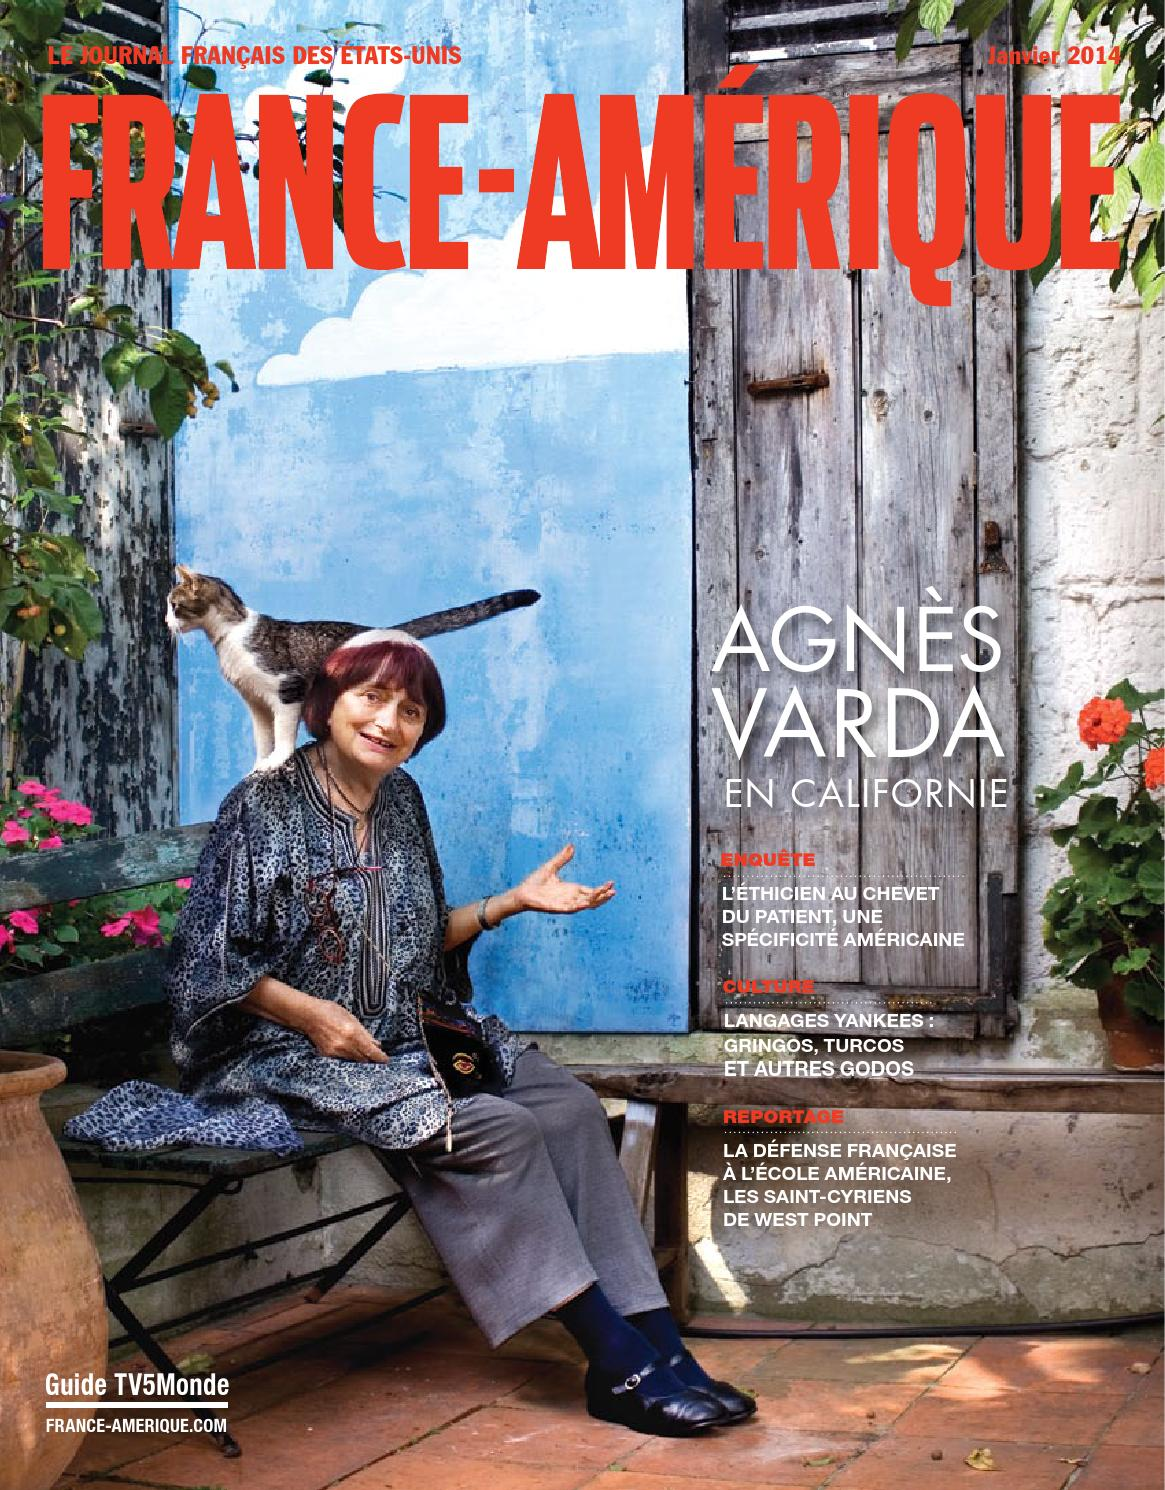 france am rique janvier 2014 by france am rique magazine issuu. Black Bedroom Furniture Sets. Home Design Ideas